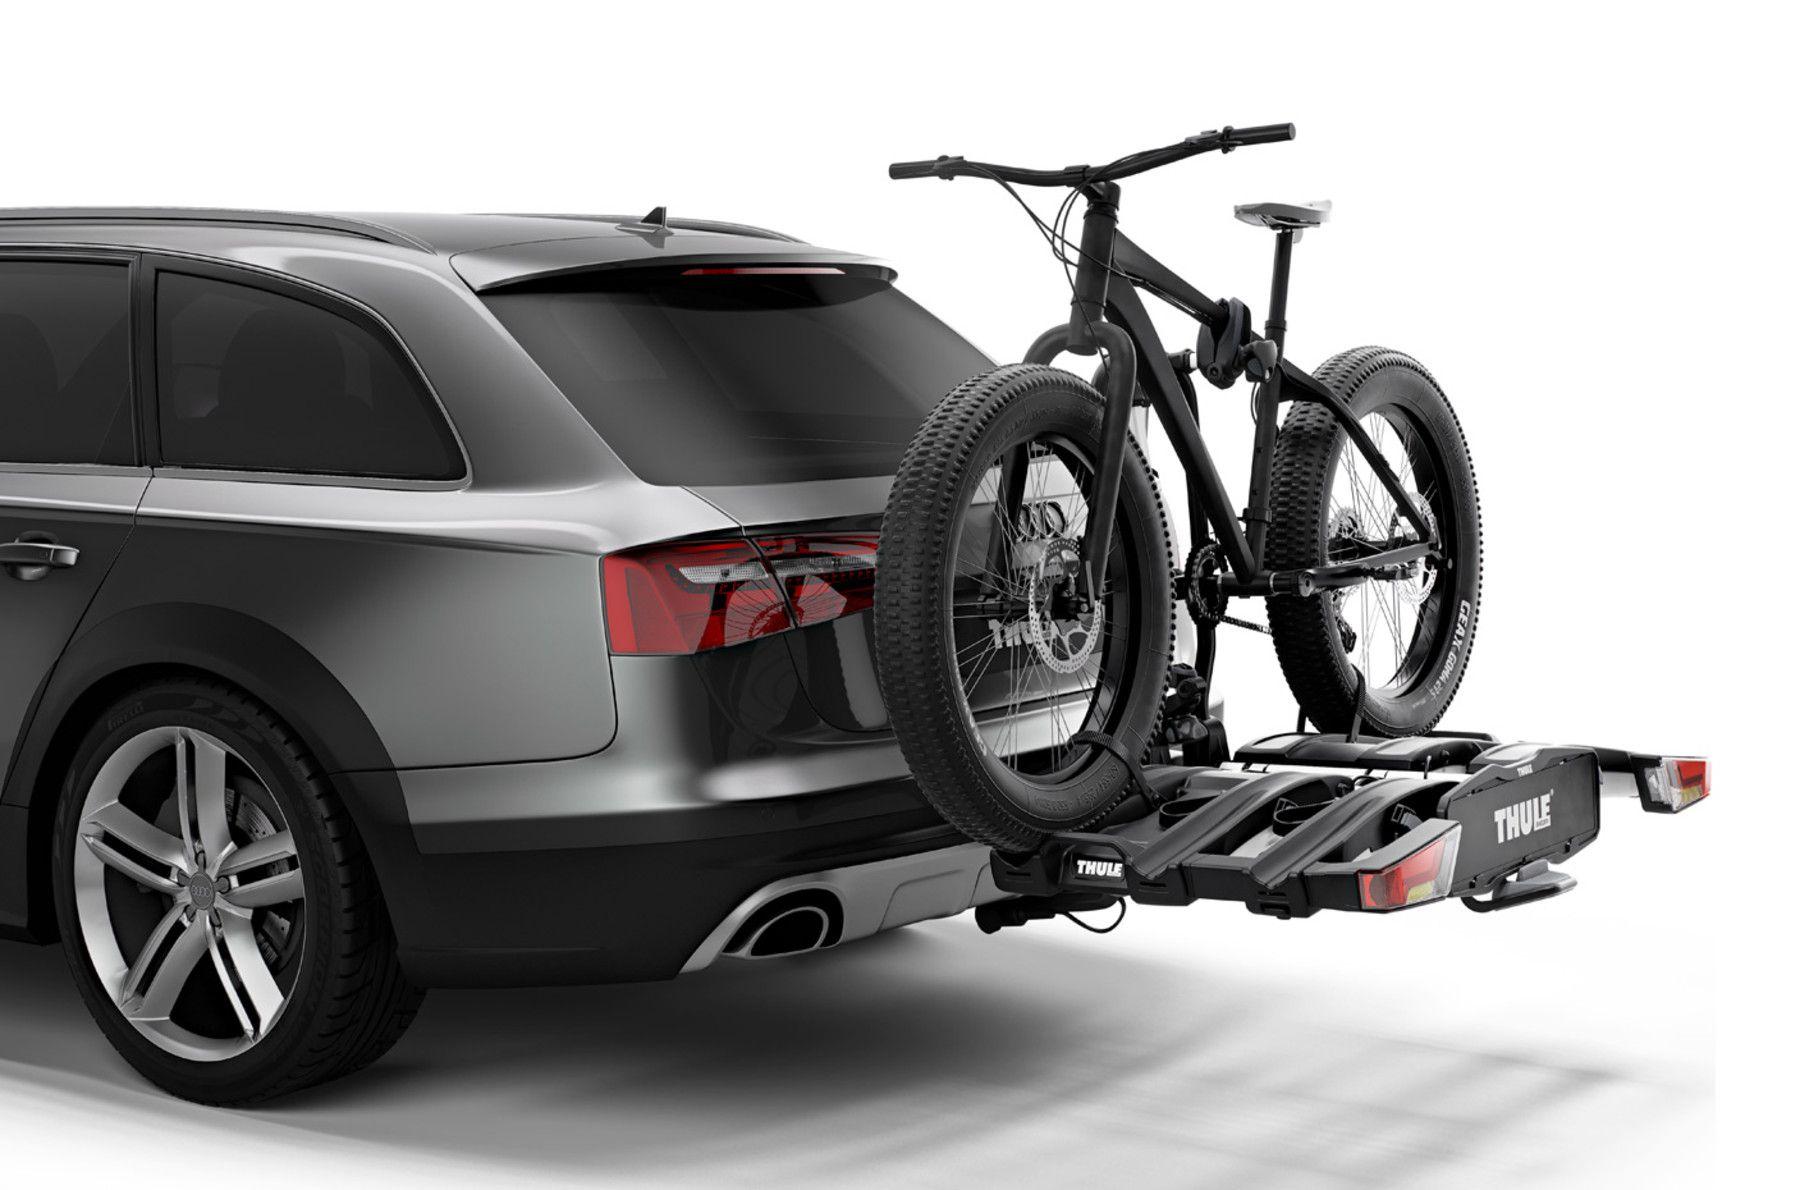 Suporte de Engate para Bicicleta Thule EasyFold XT 3